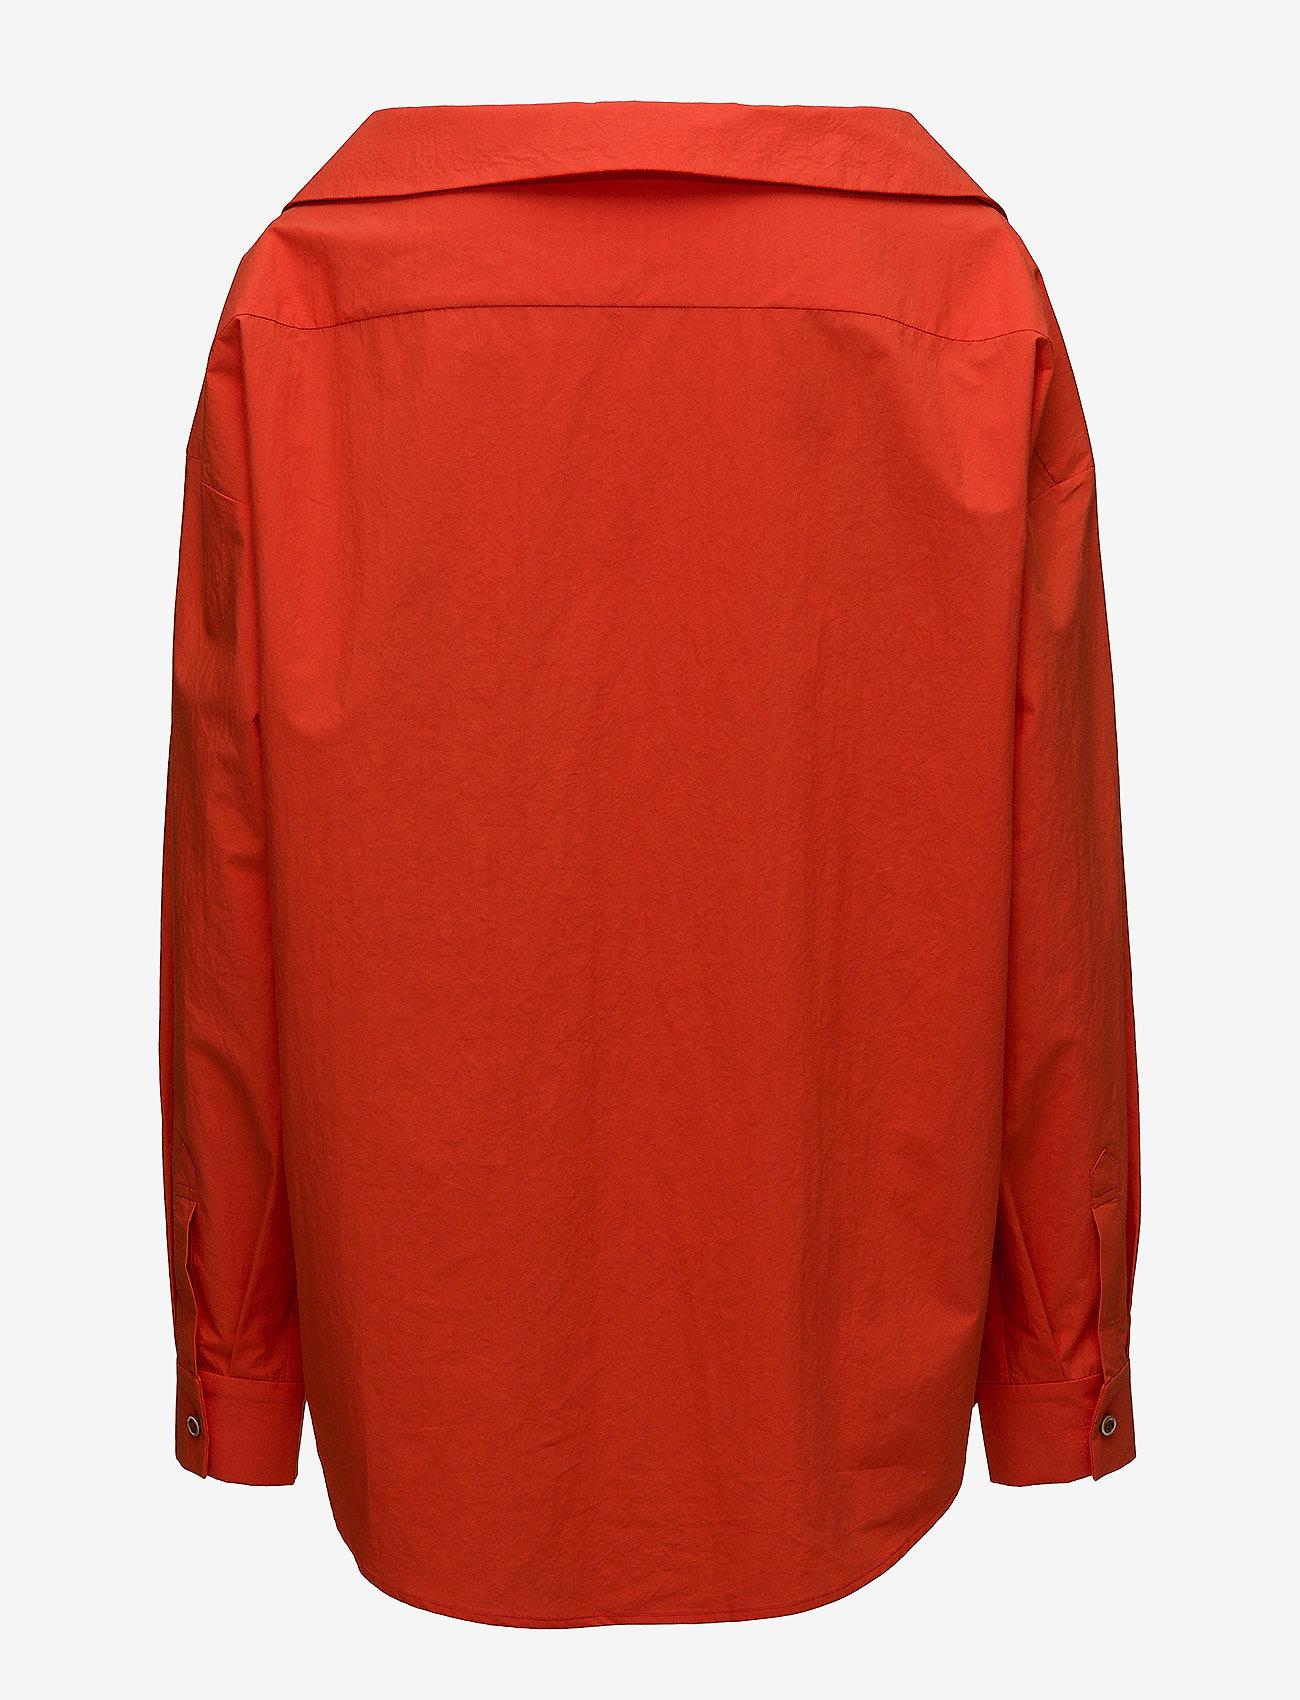 Wide V-neck Shirt  - ÁERON